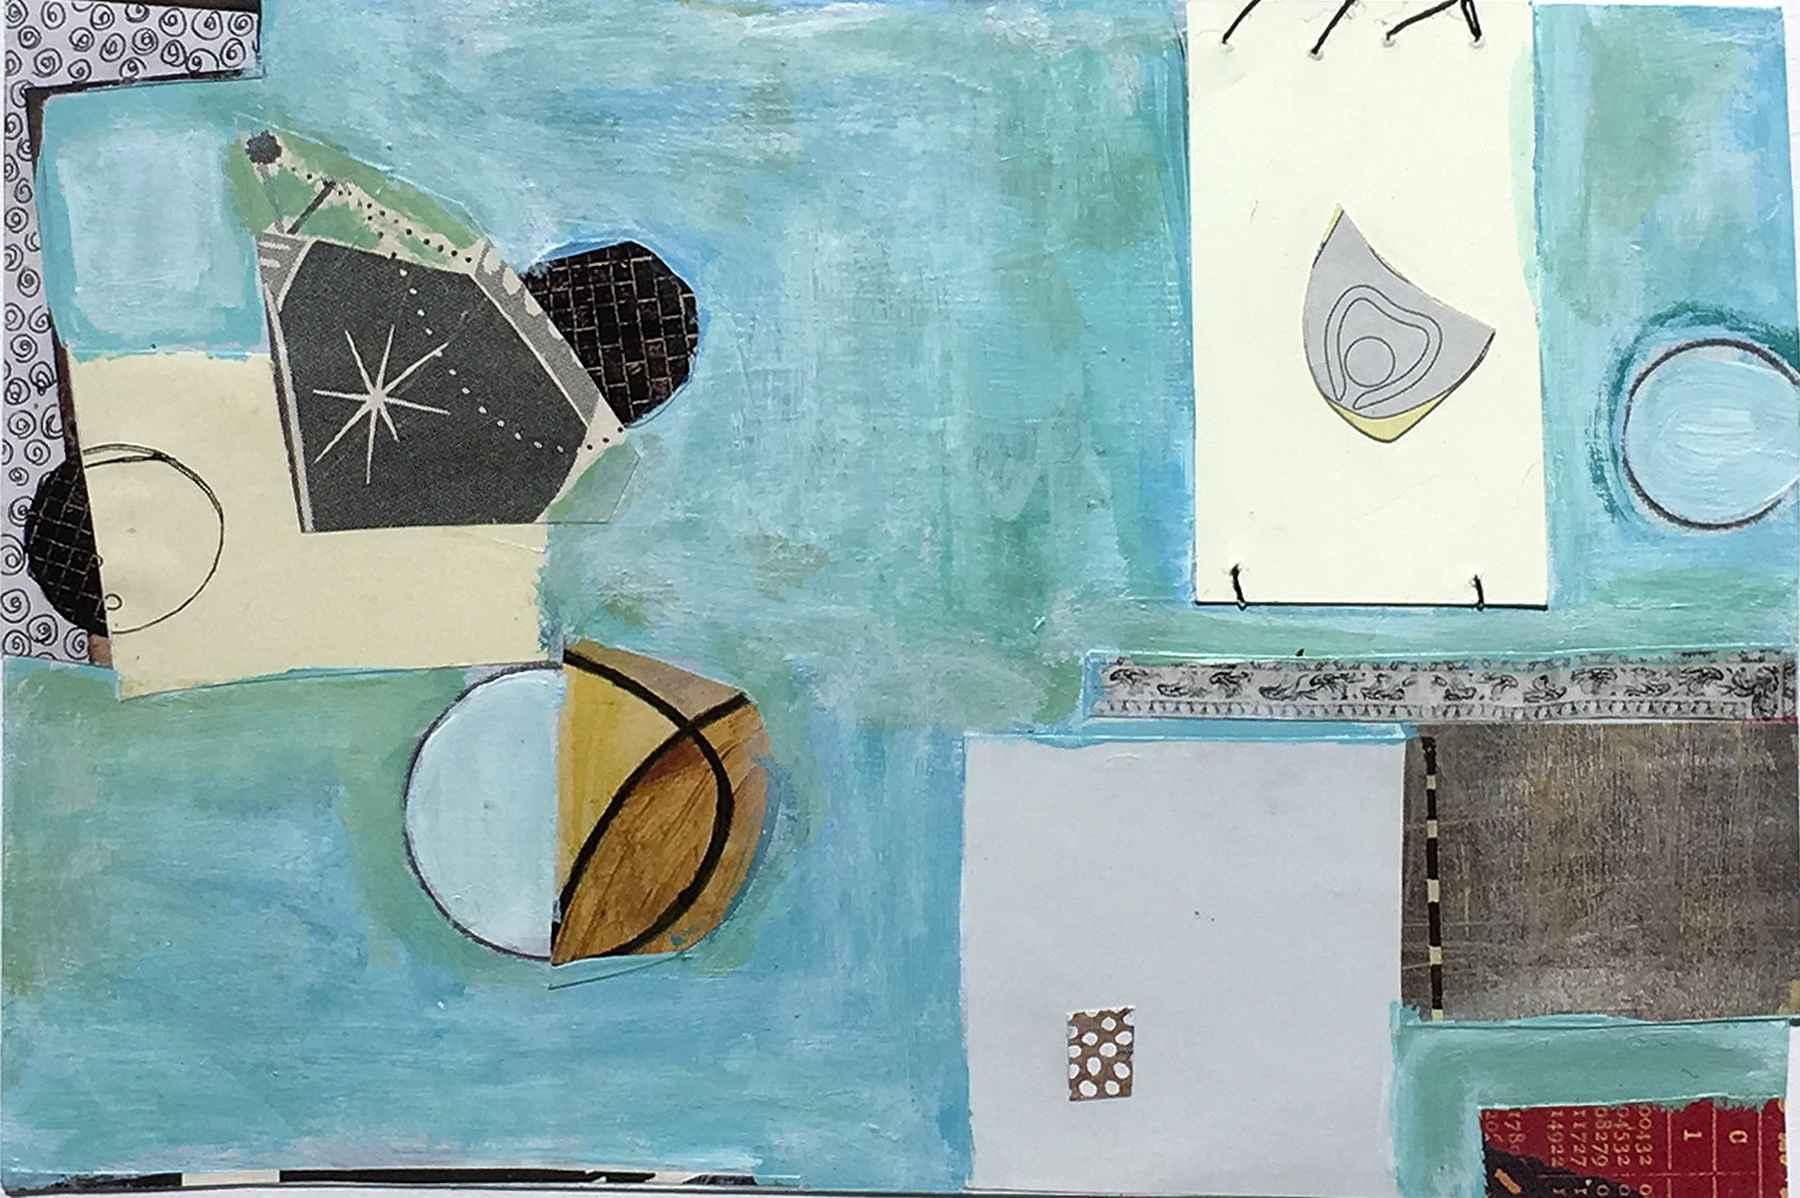 Spheres by  Andrea Fuhrman - Masterpiece Online